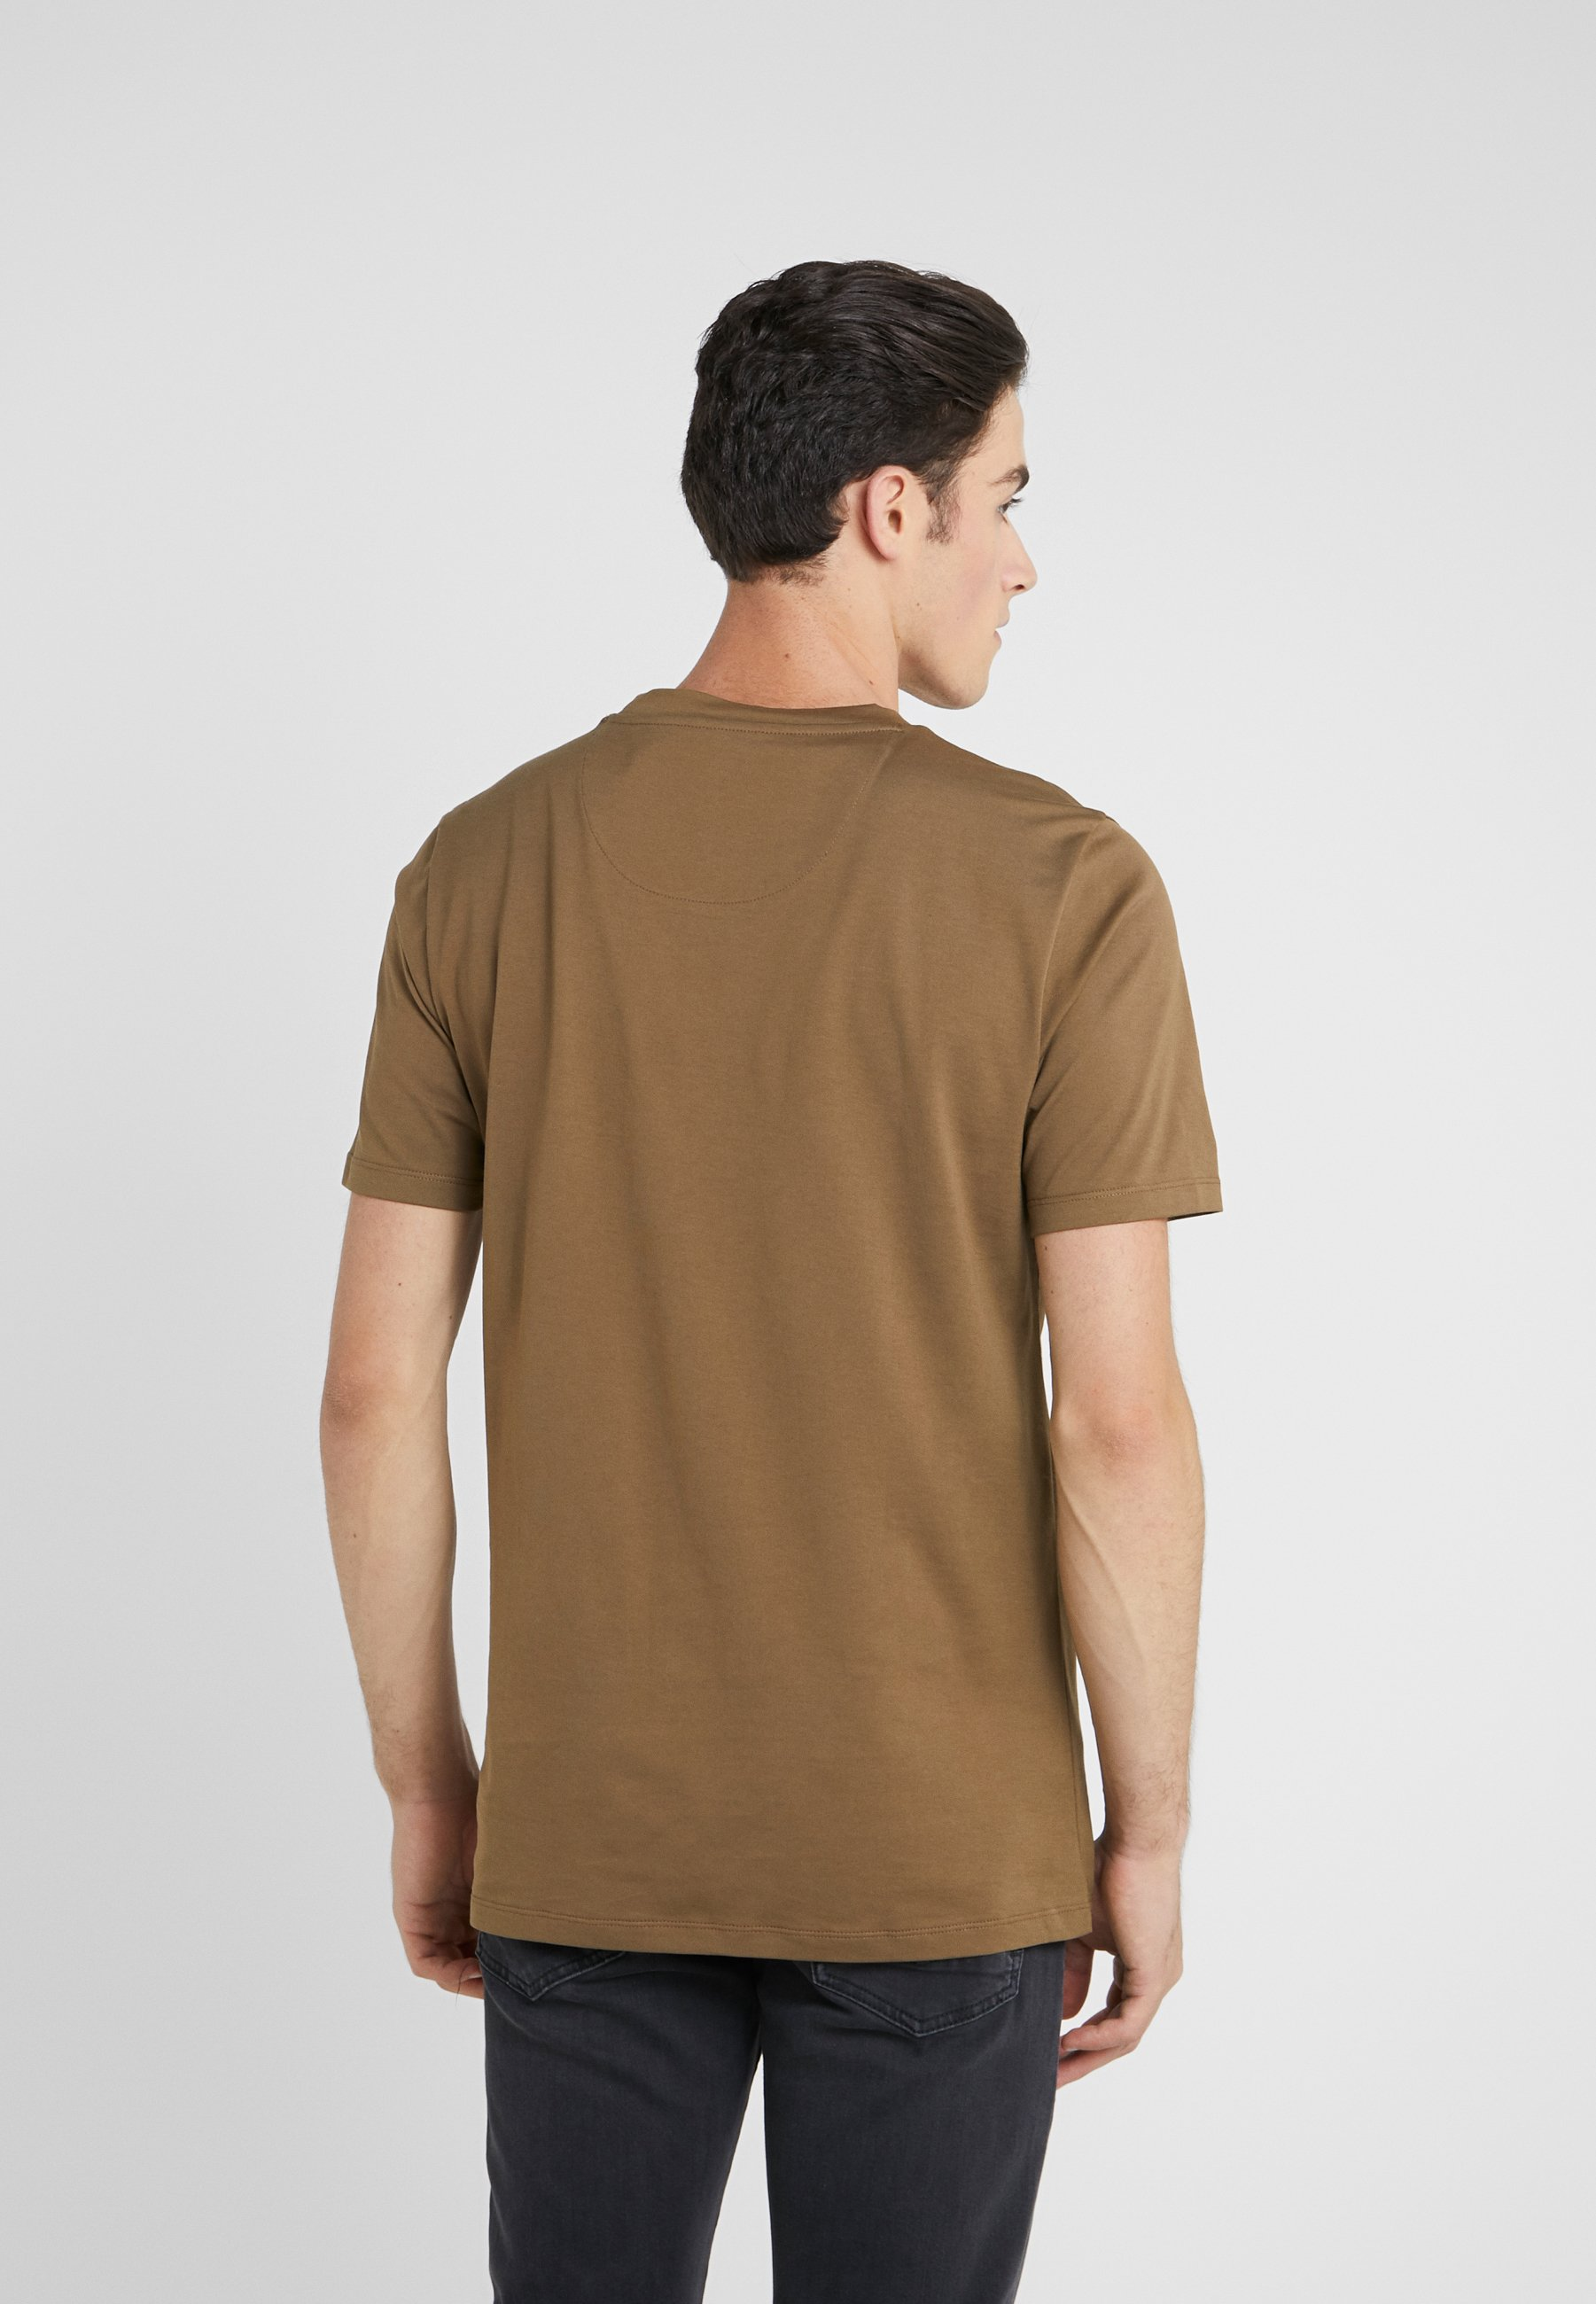 Military Hugo Dicagolino Green Liam PayneT shirt Imprimé nwOP08k